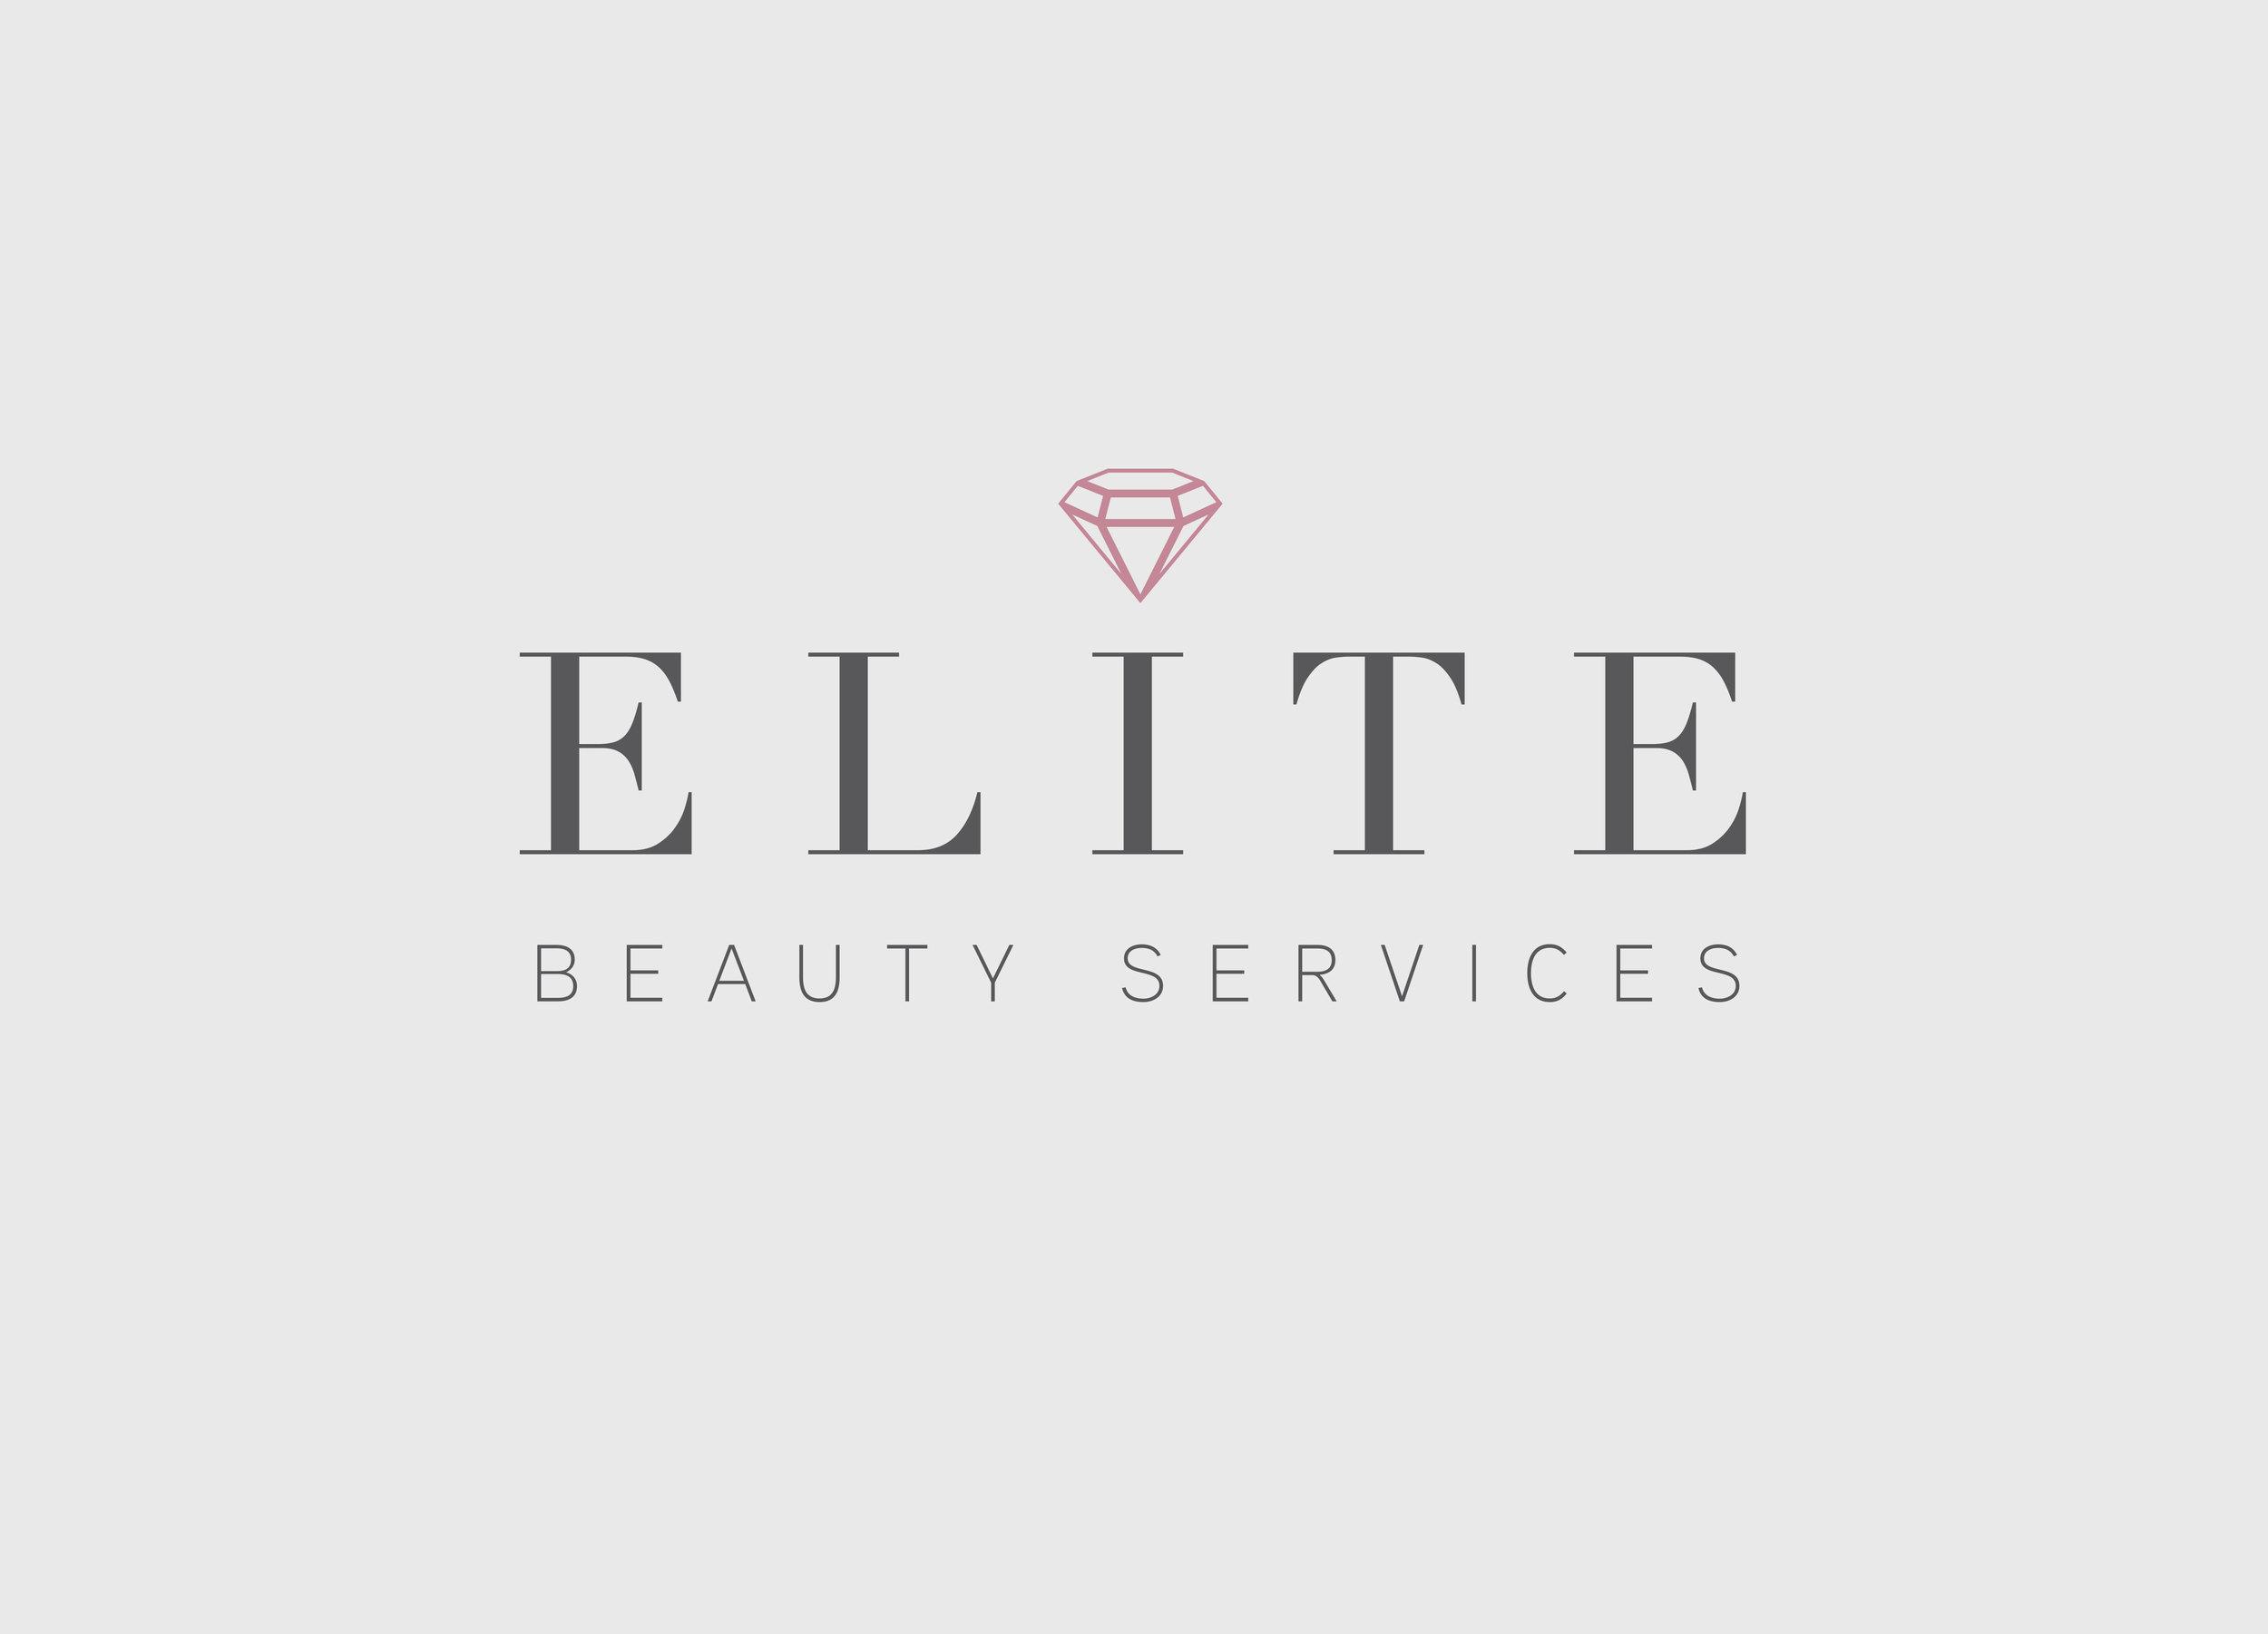 Elite-Beauty-Stationary-logo.jpg